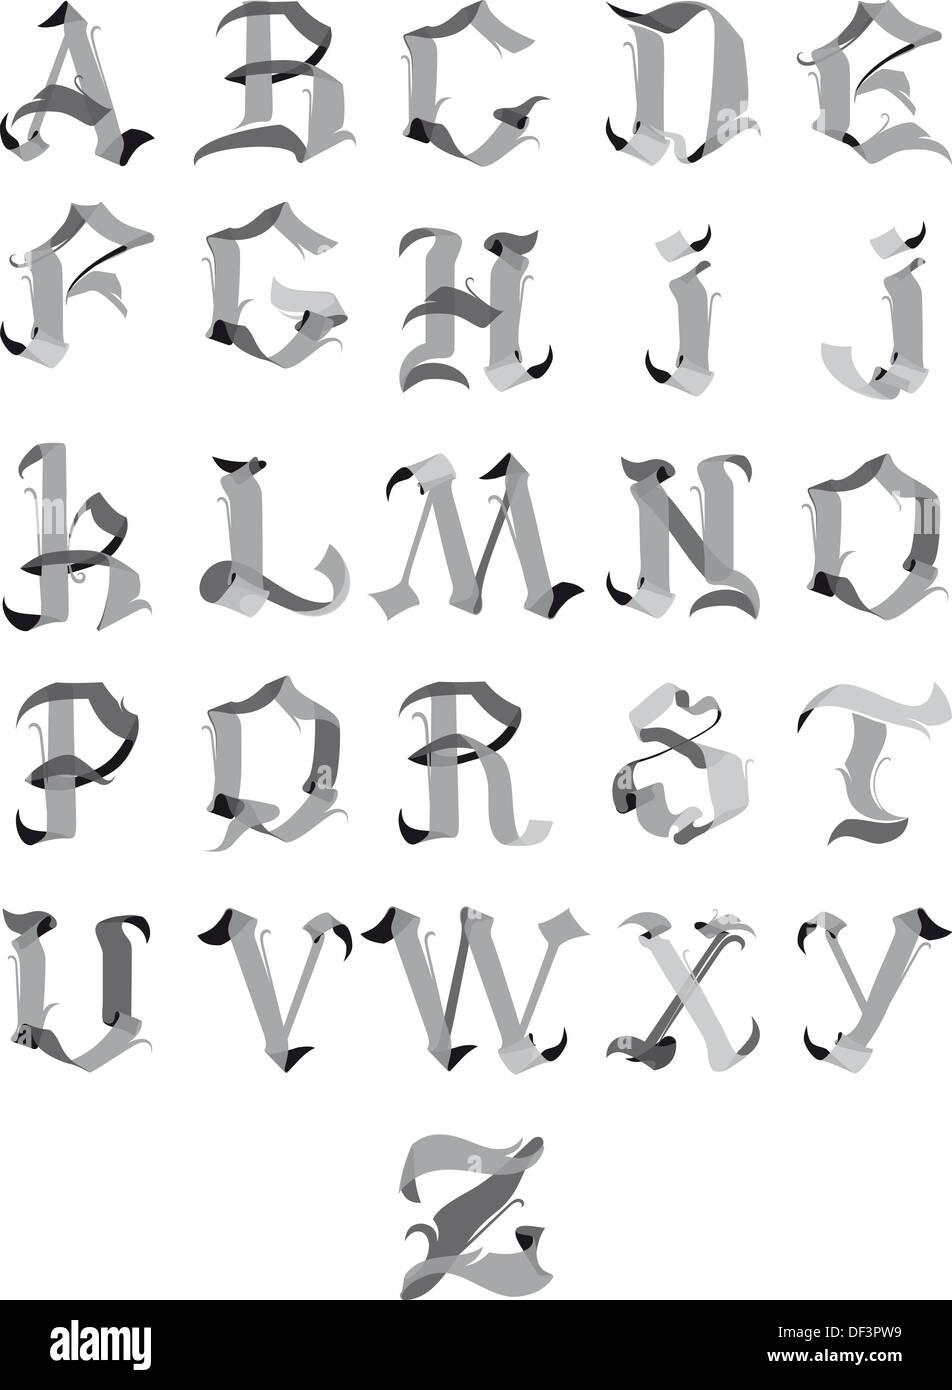 Caligrafia Alfabeto Gotico Alfabeto Completo Estilo Gótico Vector